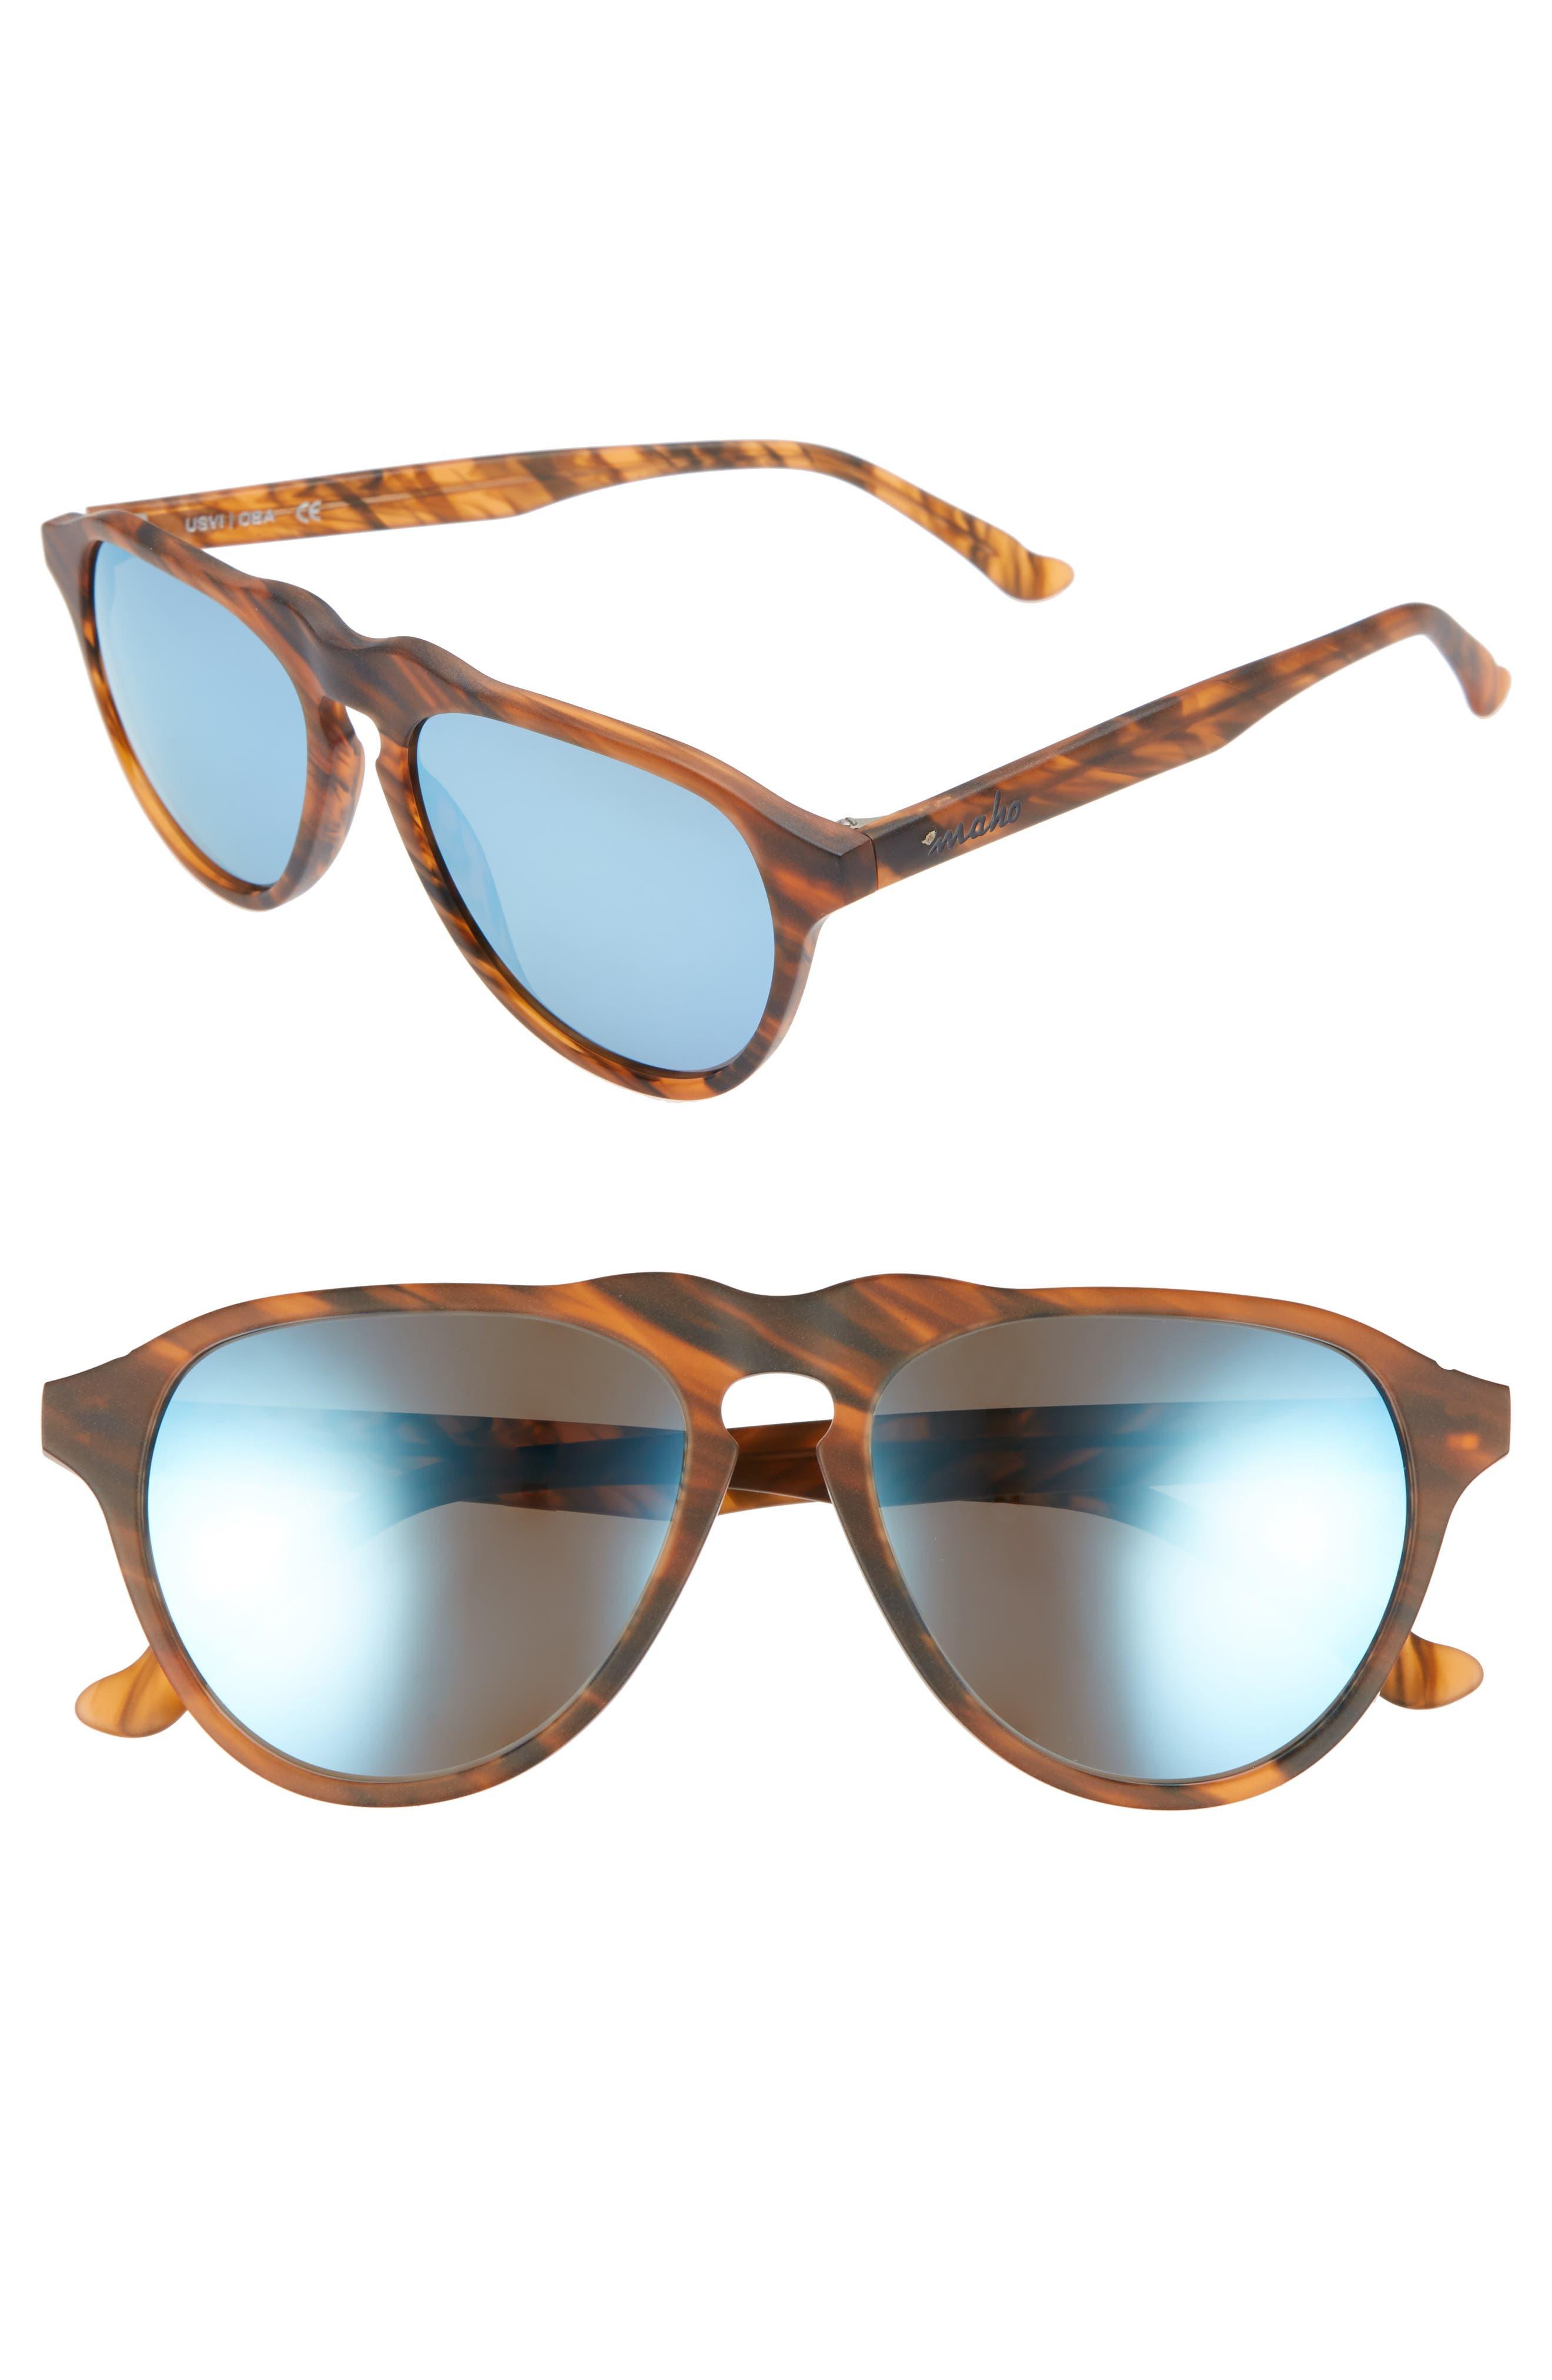 Nashville 54mm Polarized Aviator Sunglasses,                         Main,                         color, Whisky